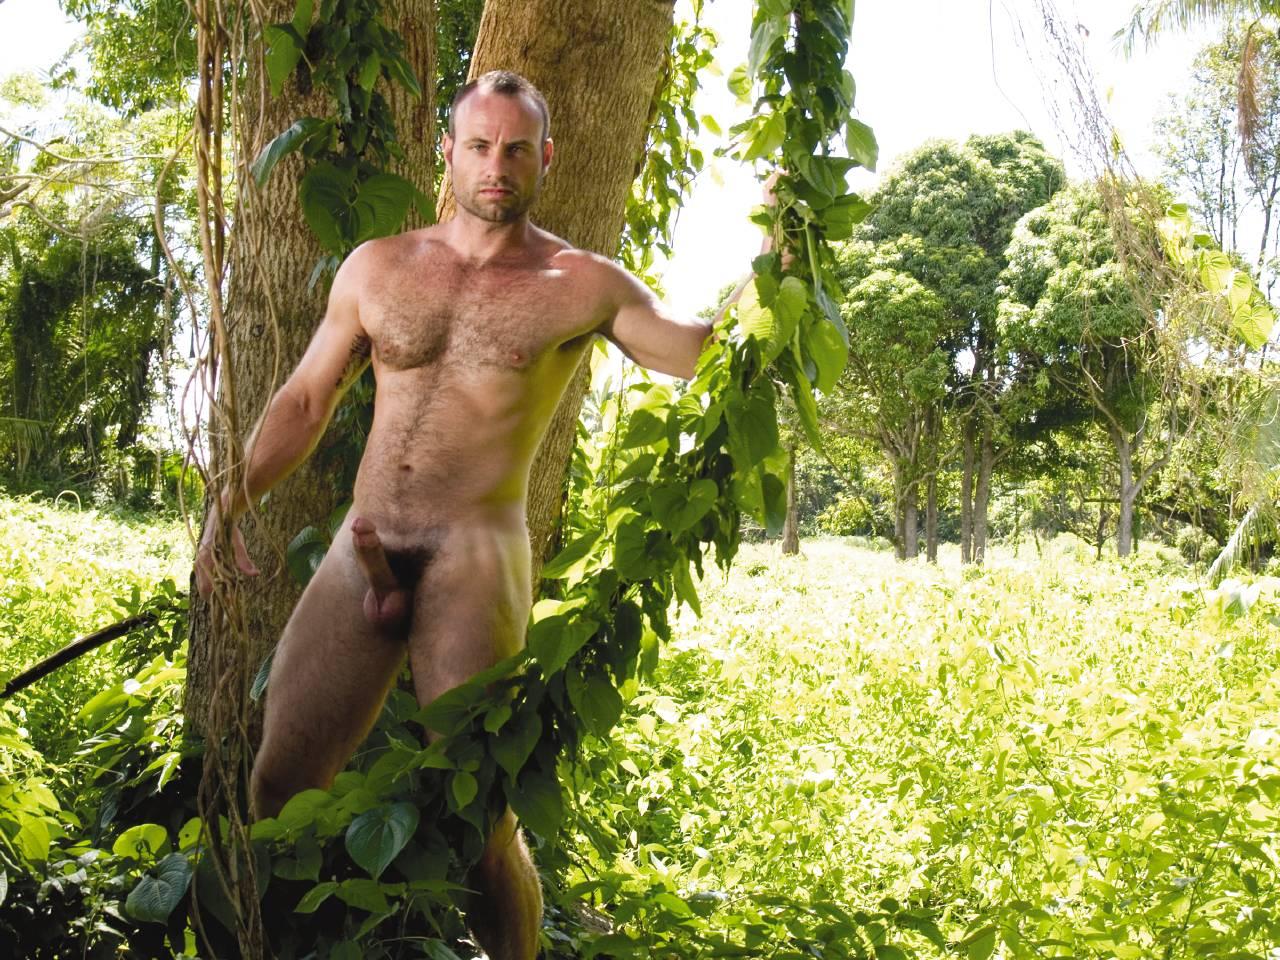 Naked Men Outdoors Videos